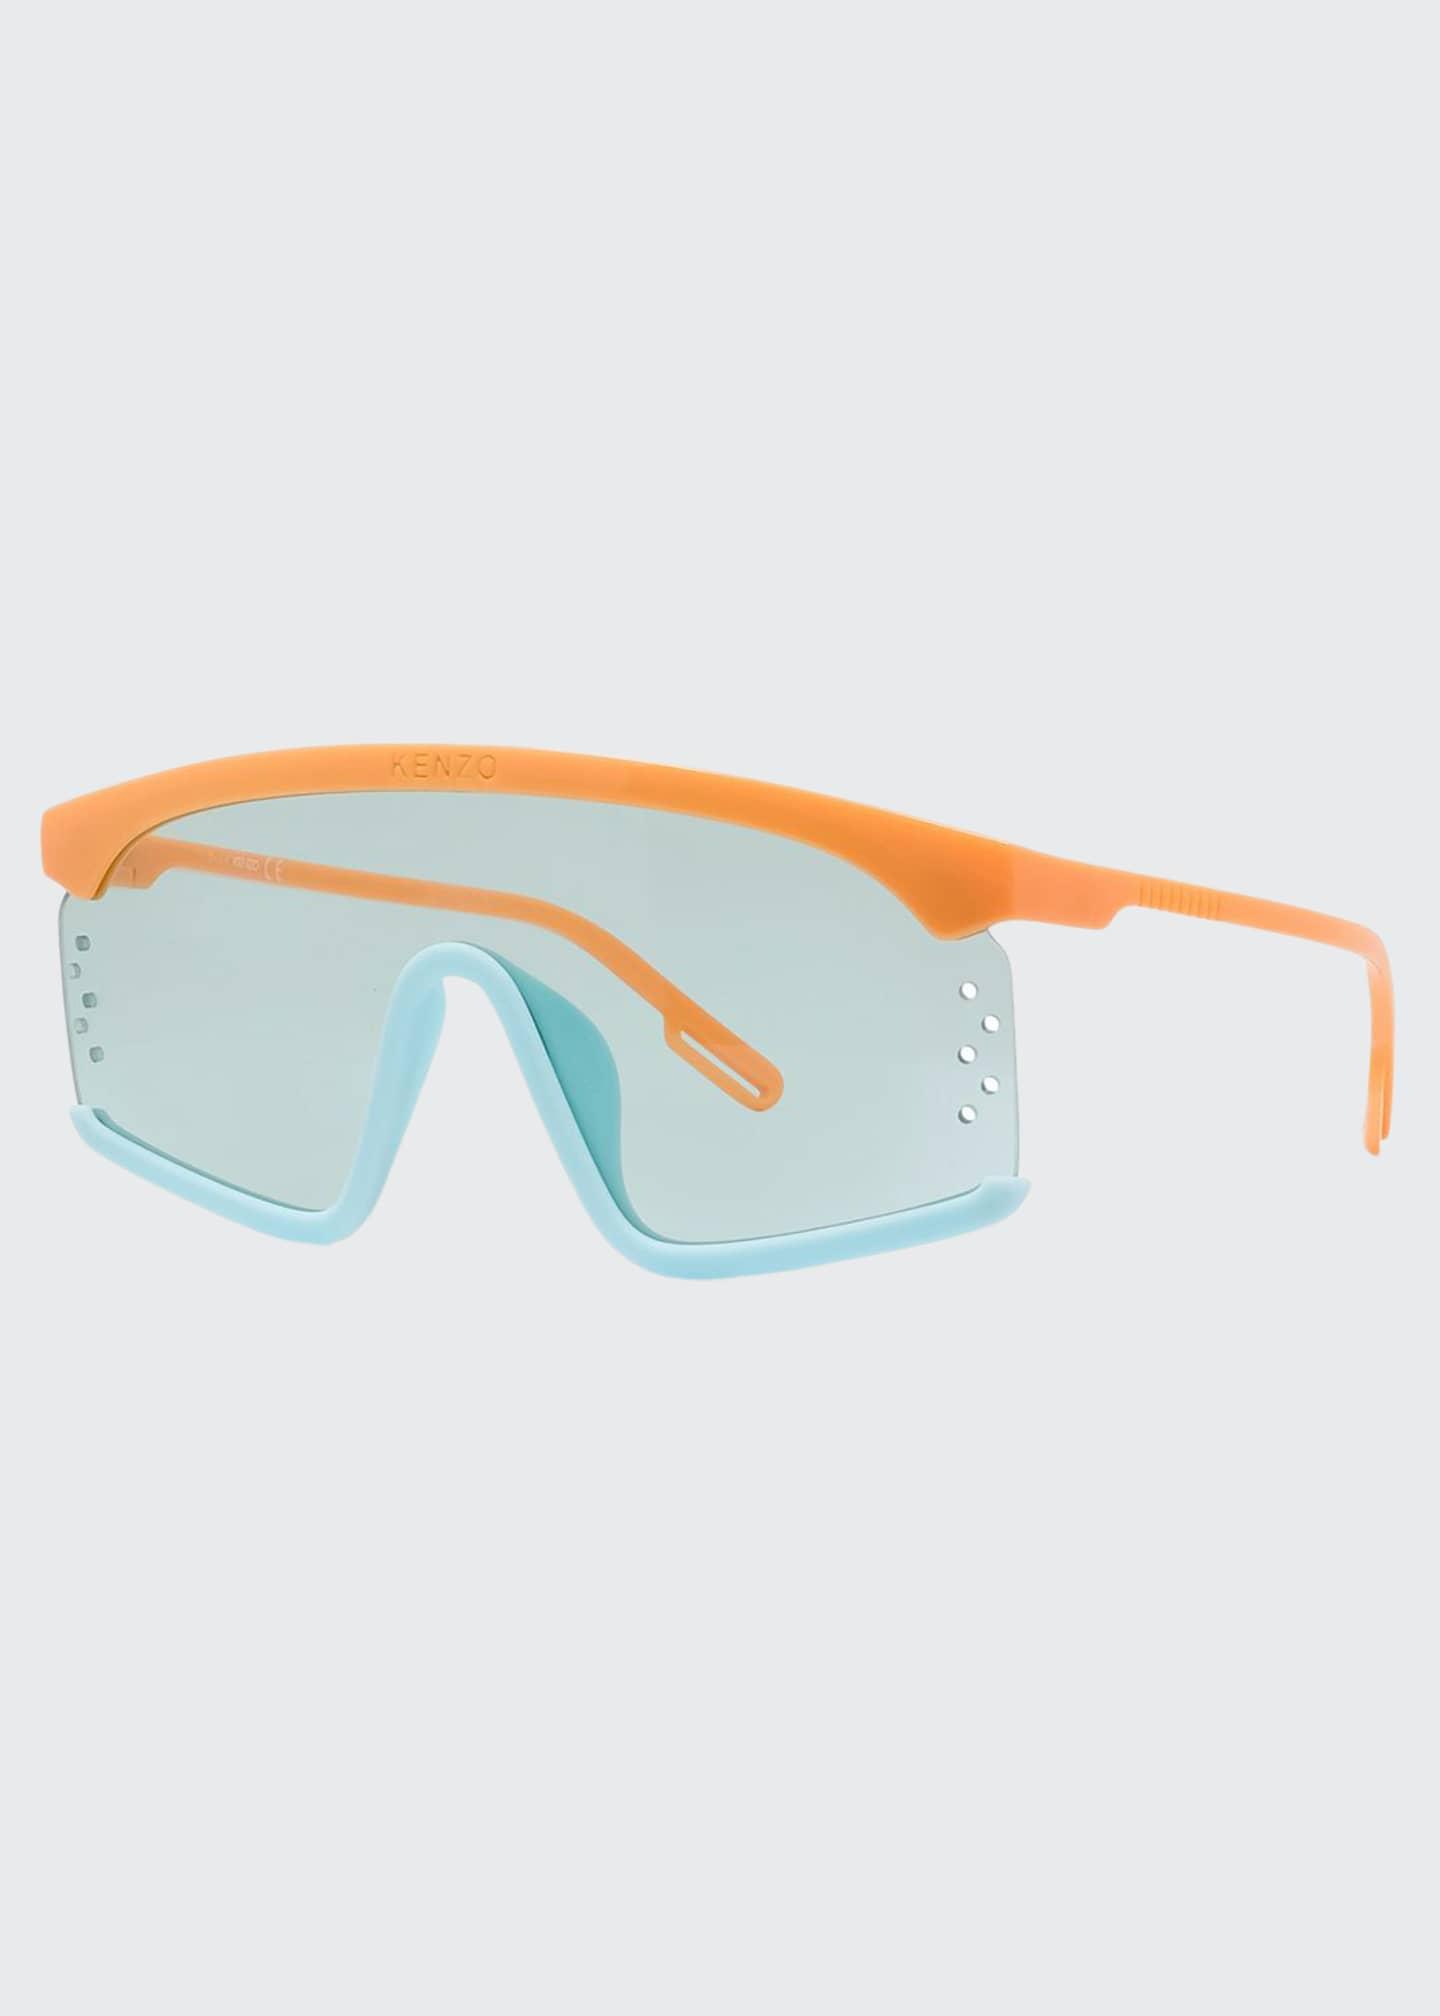 Kenzo Men's Two-Tone Acetate Shield Sunglasses